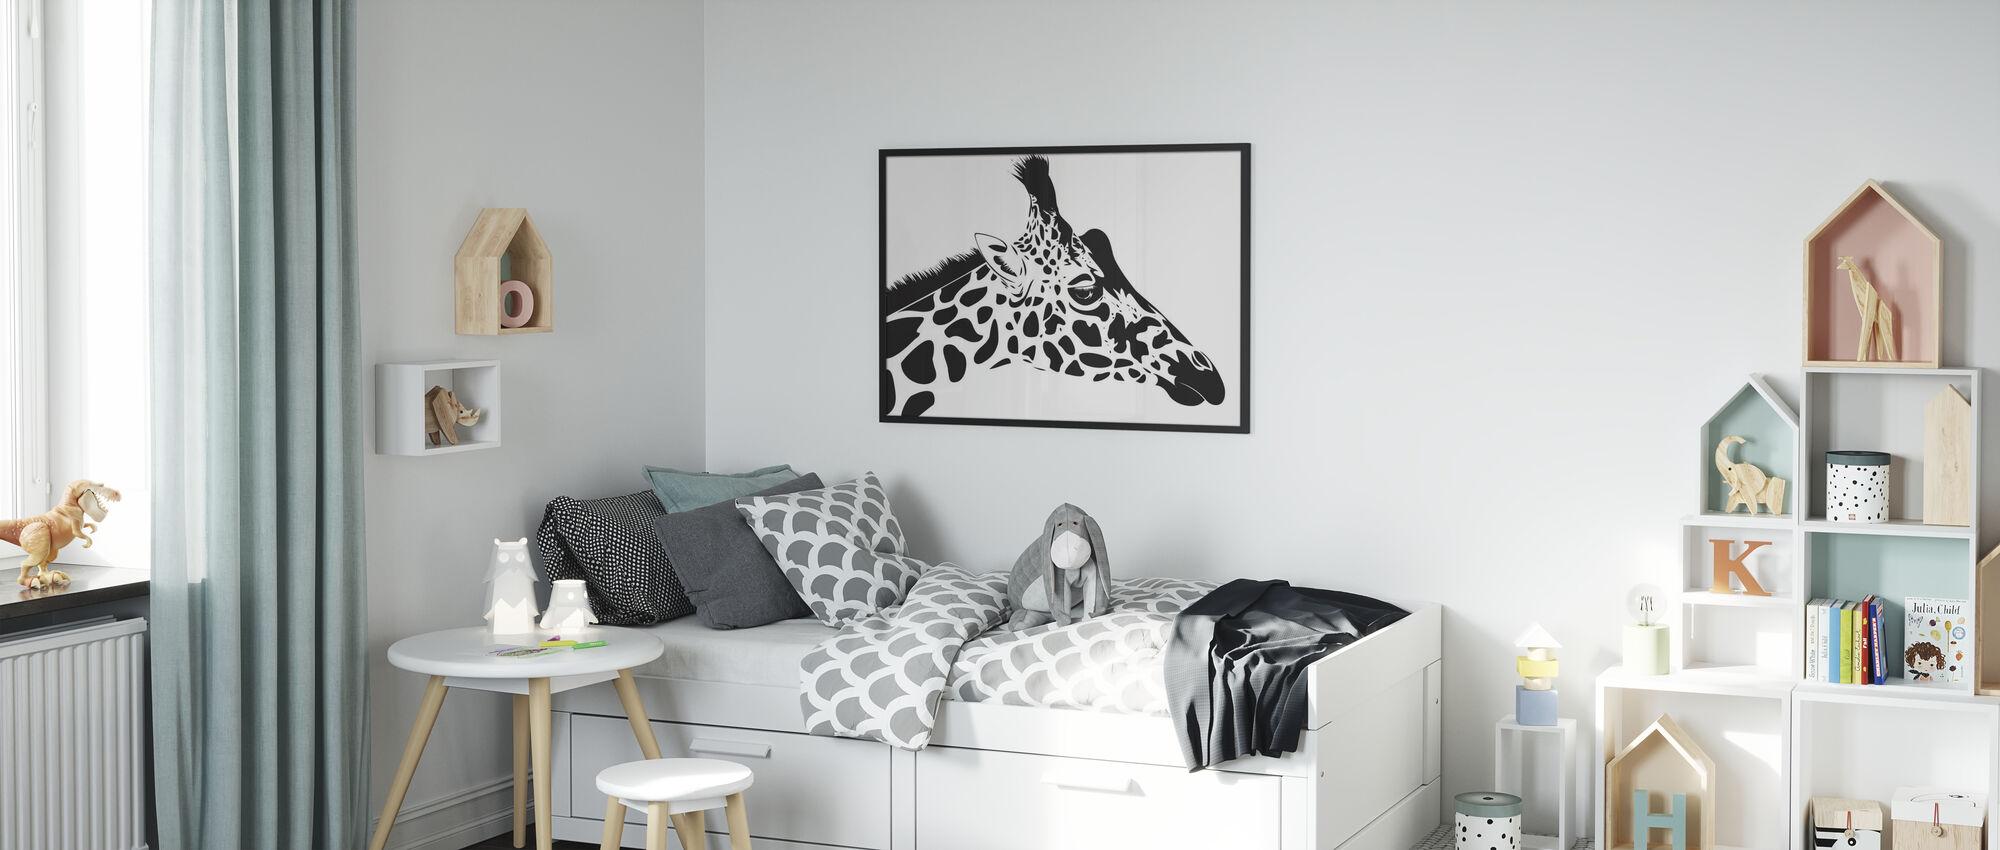 Girafe - Affiche - Chambre des enfants